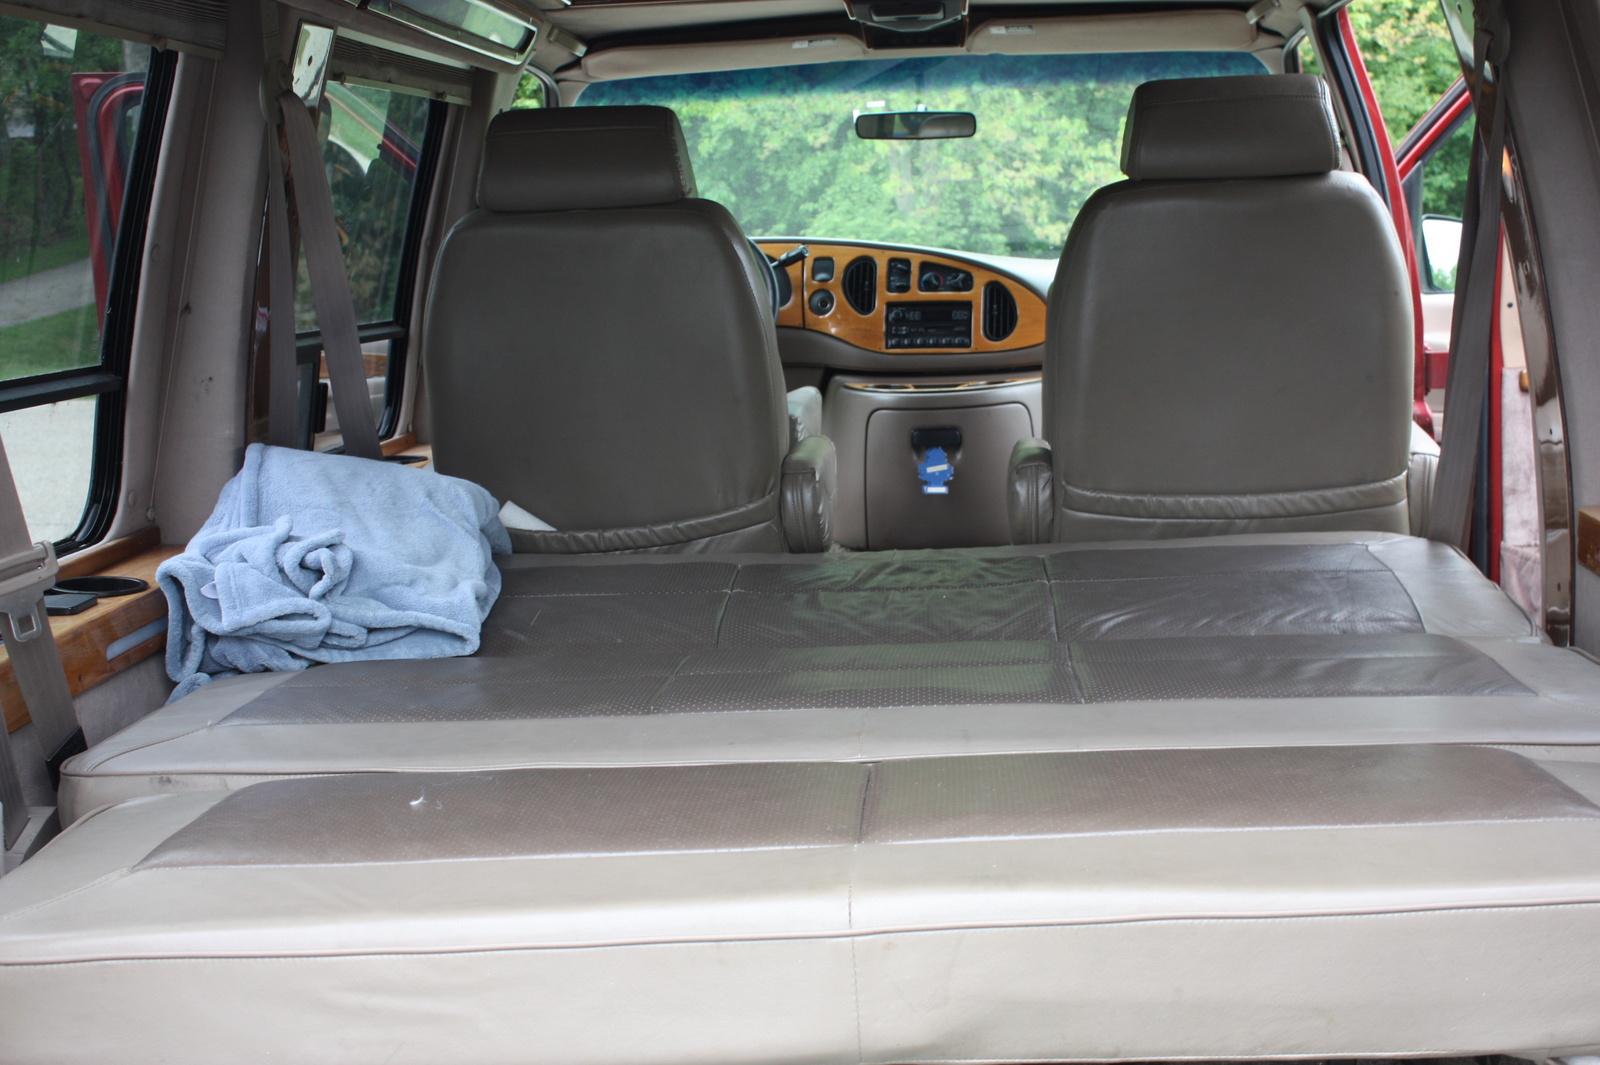 1997 Ford E150 Interior E 150 Fuse Box Diagram Information And Photos Zombiedrive 1600x1065